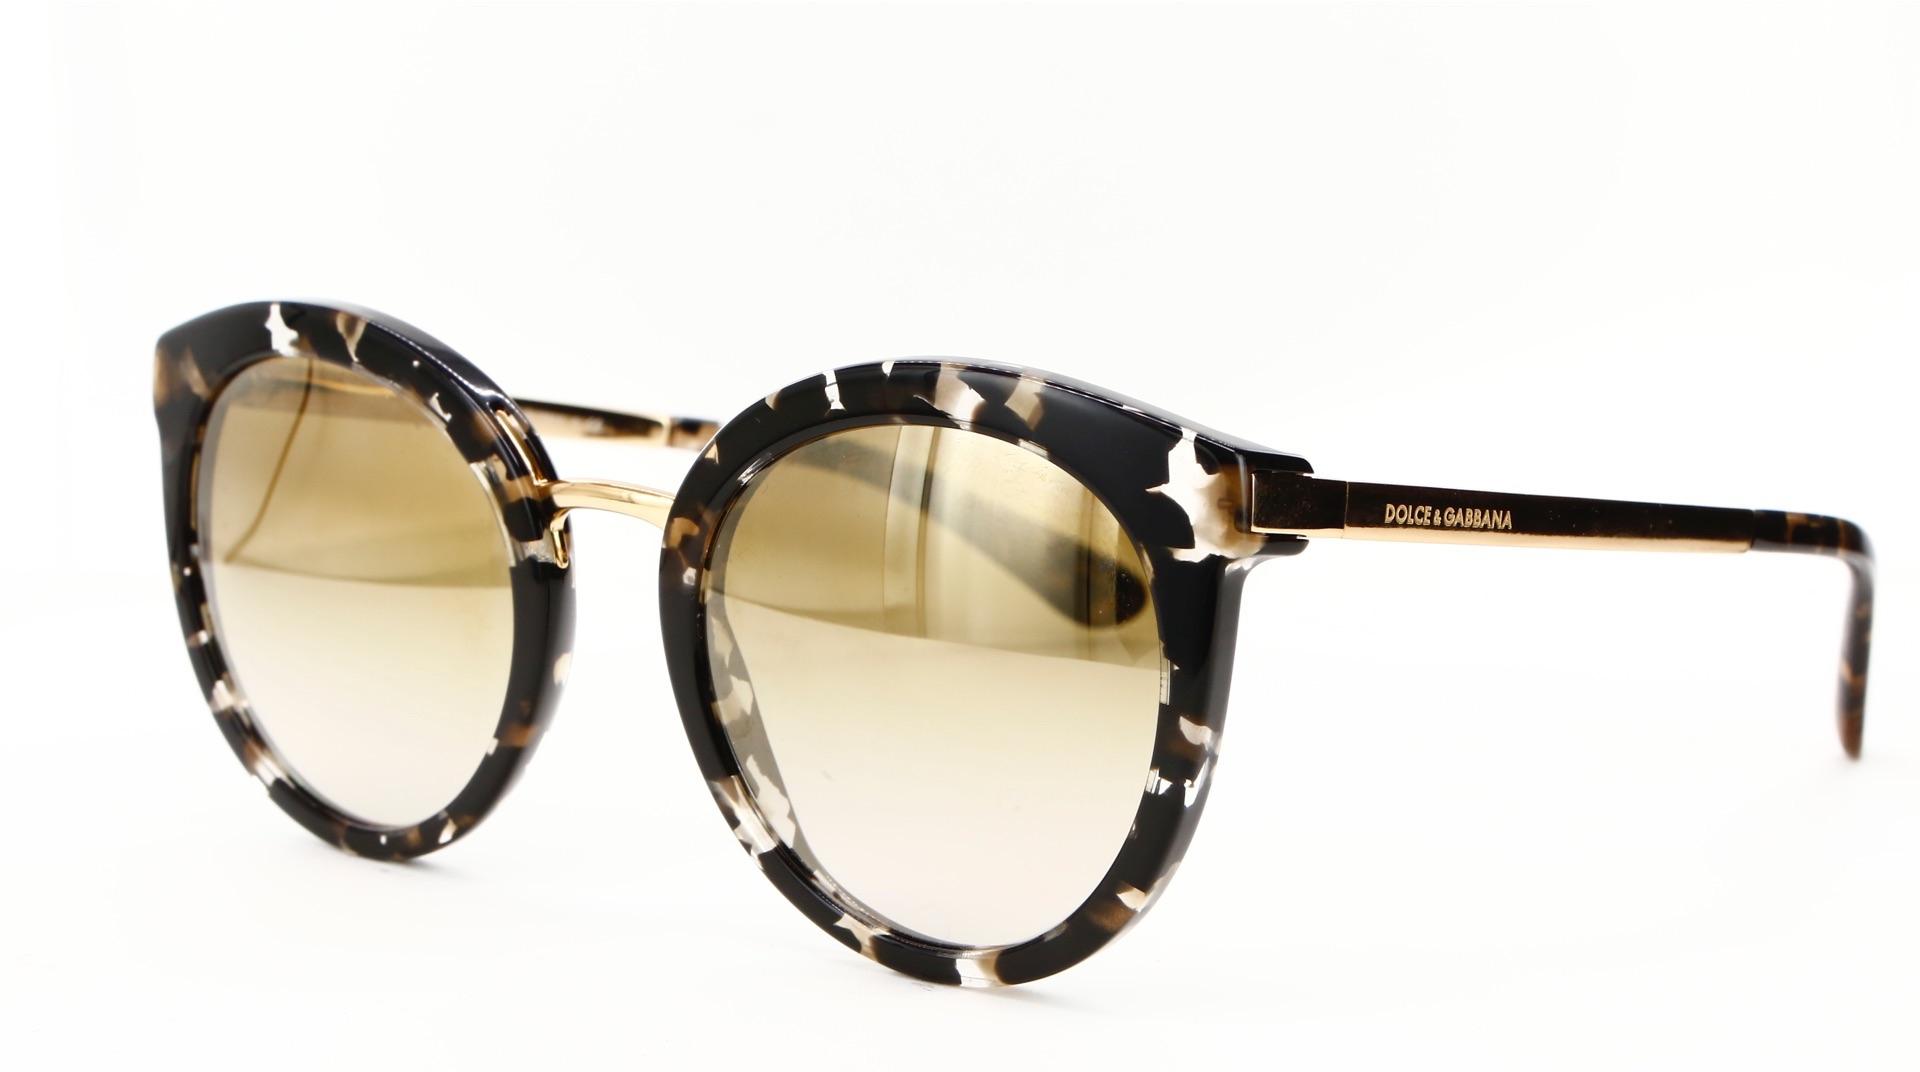 Dolce & Gabbana - ref: 79419